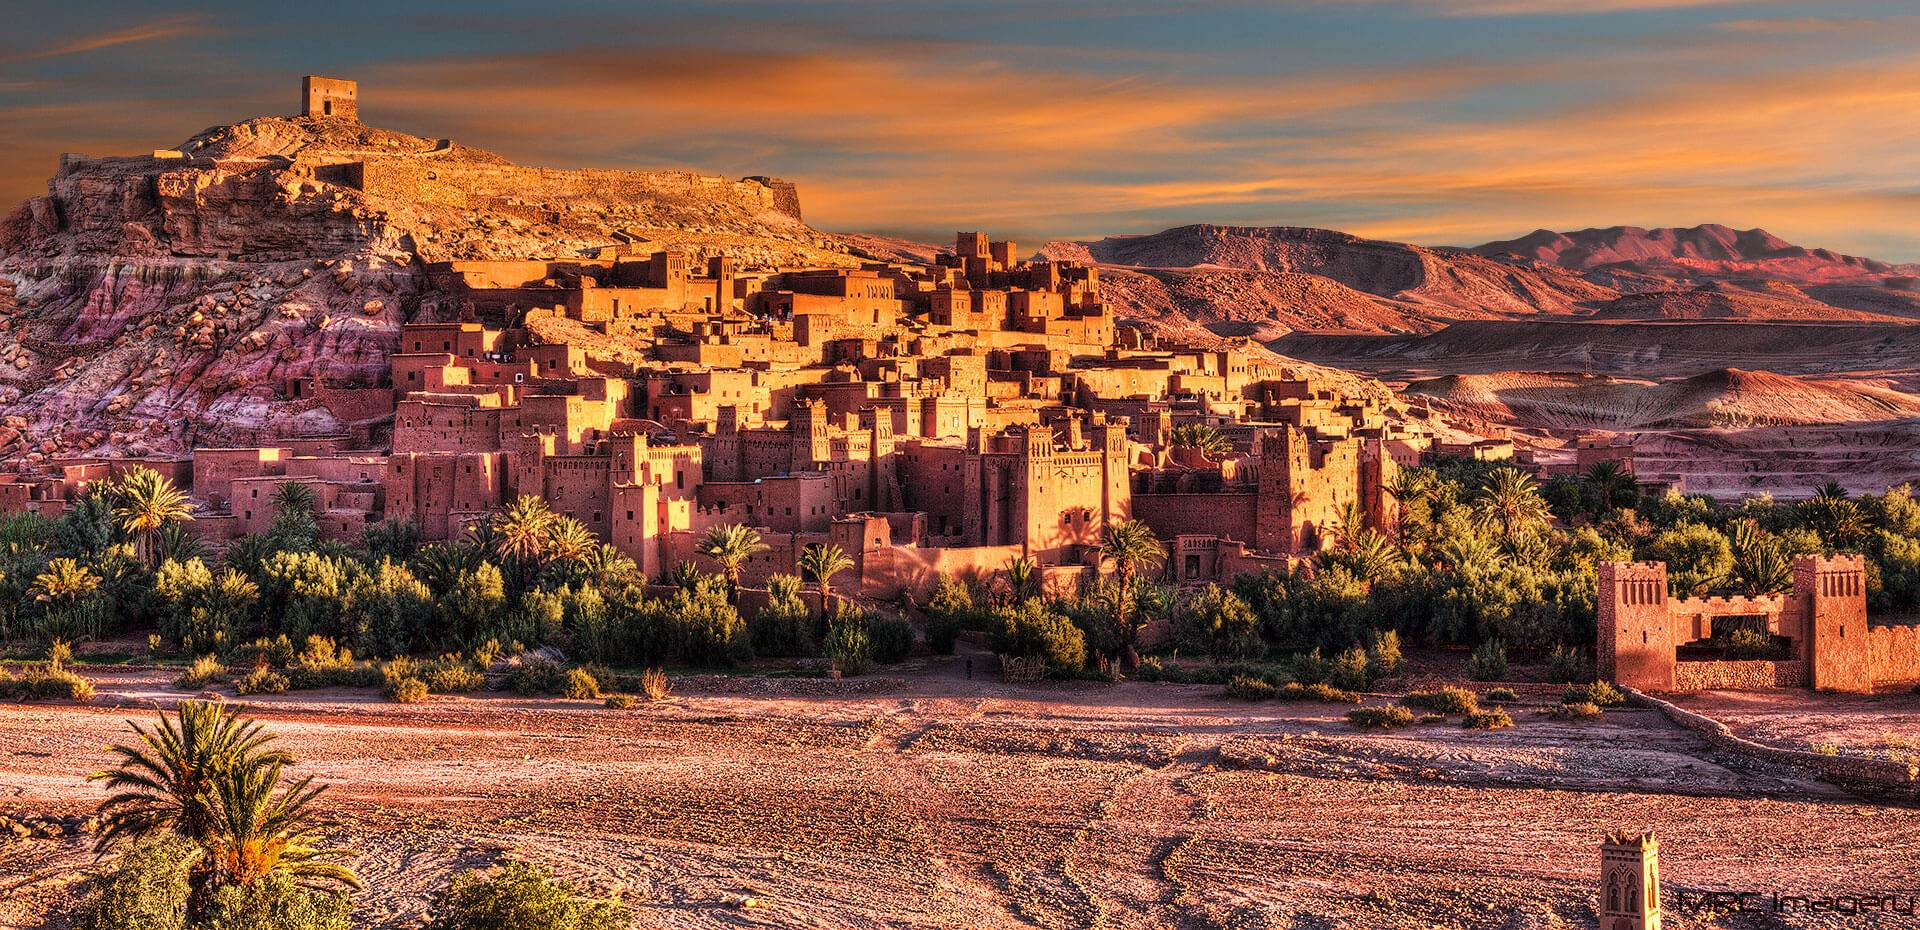 circuit marrakech circuit sud maroc